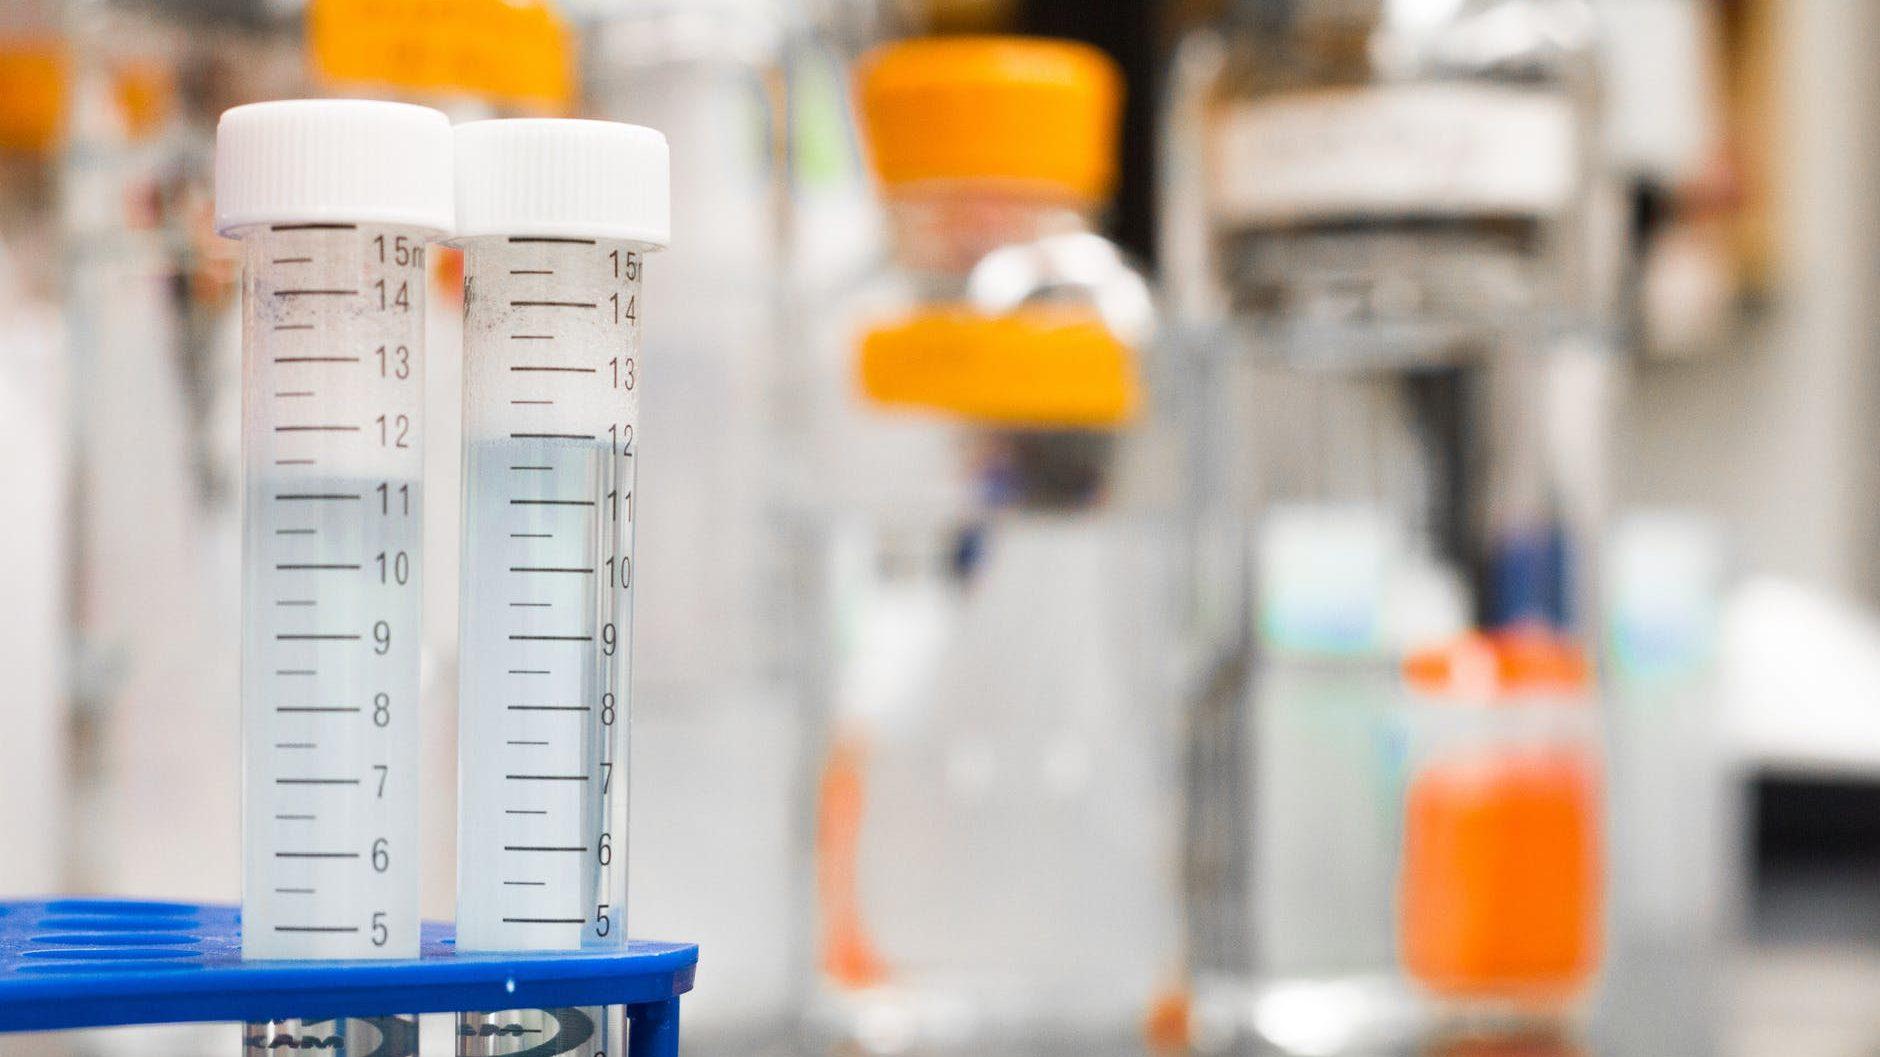 Científicos desarrollan enjuague bucal para detectar Covid-19